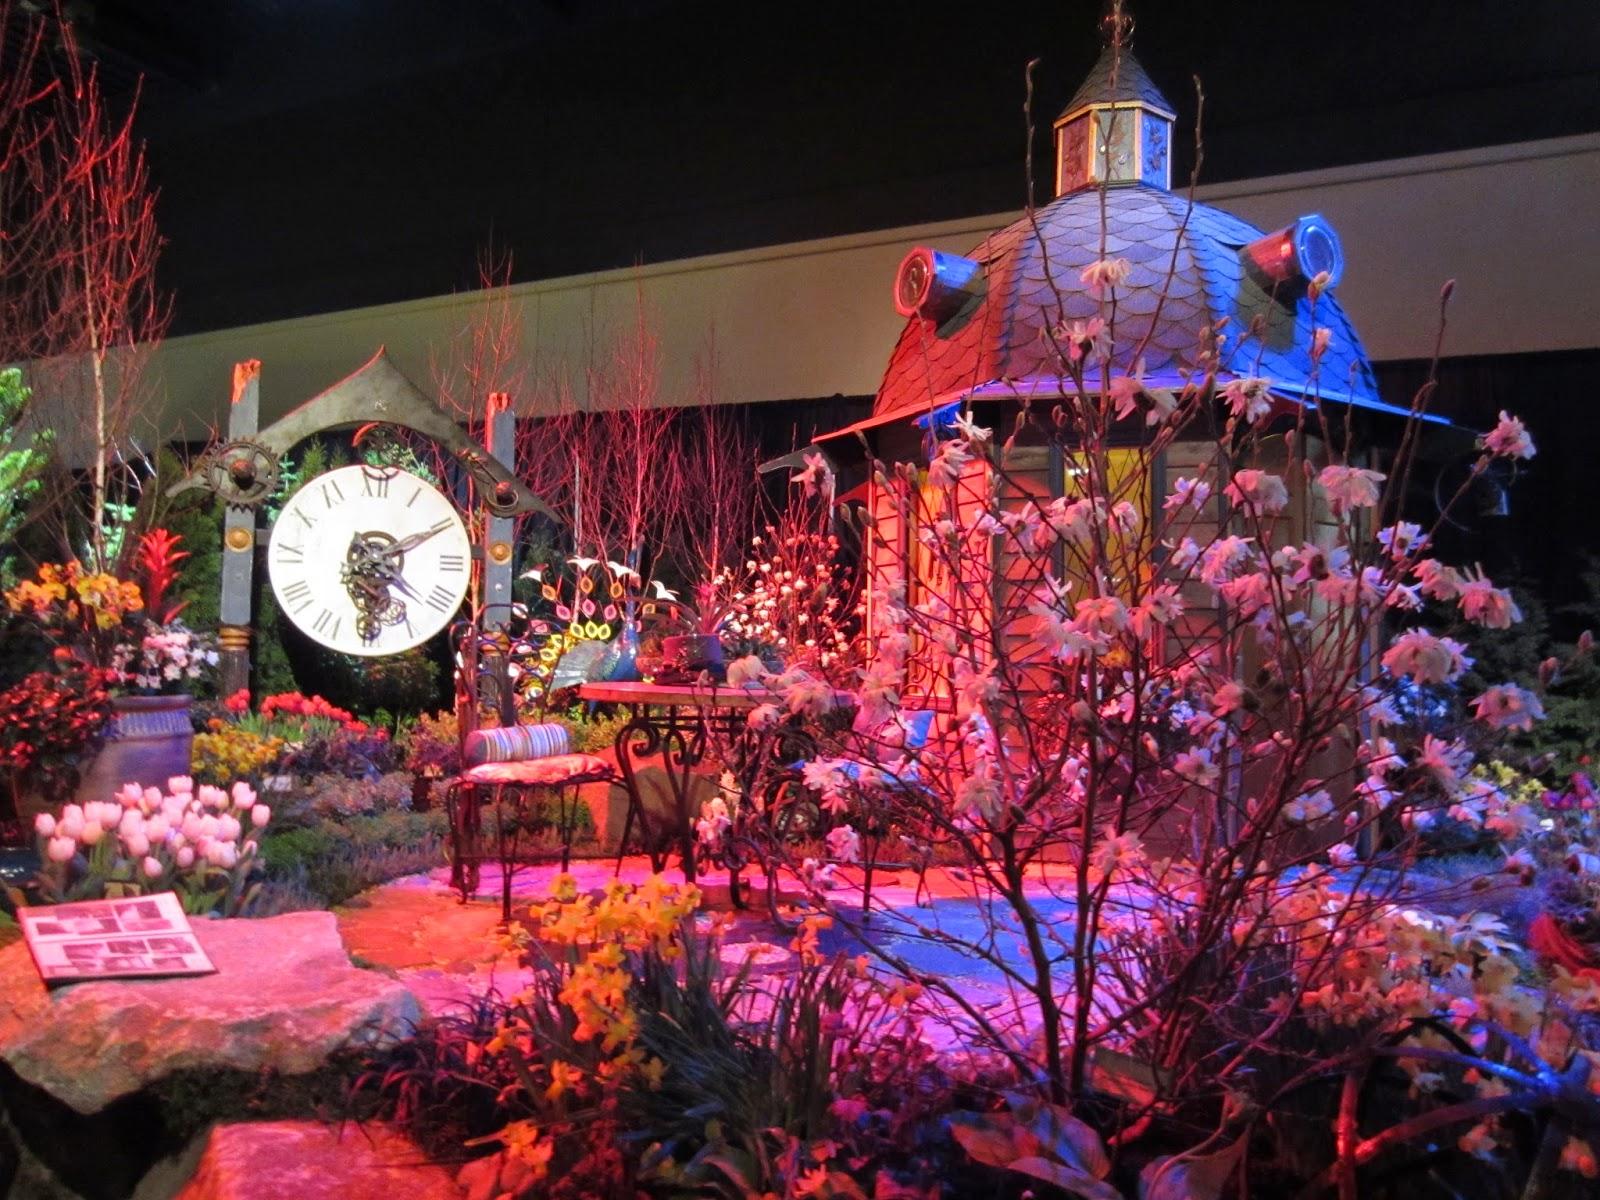 Beatrice euphemie the northwest flower and garden show - Northwest flower and garden show ...